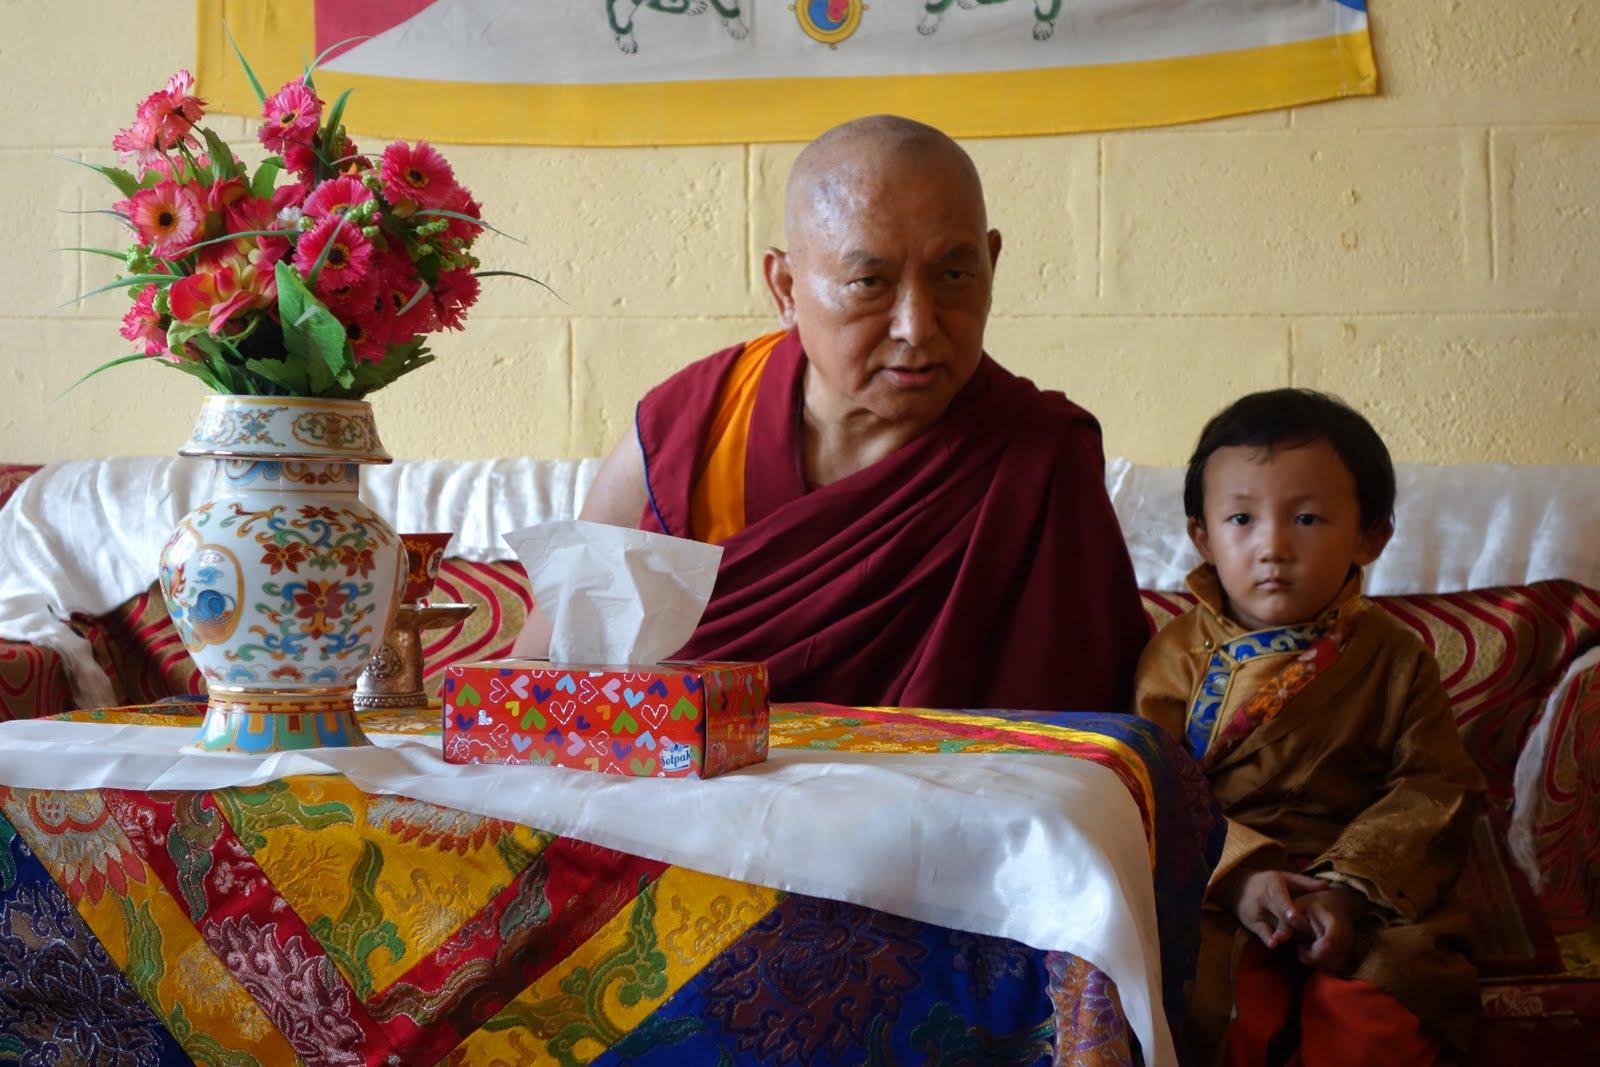 Rinpoche and a young lama at Kopan Nunnery. August 8, 2013 Photo: Ven.Roger Kunsang